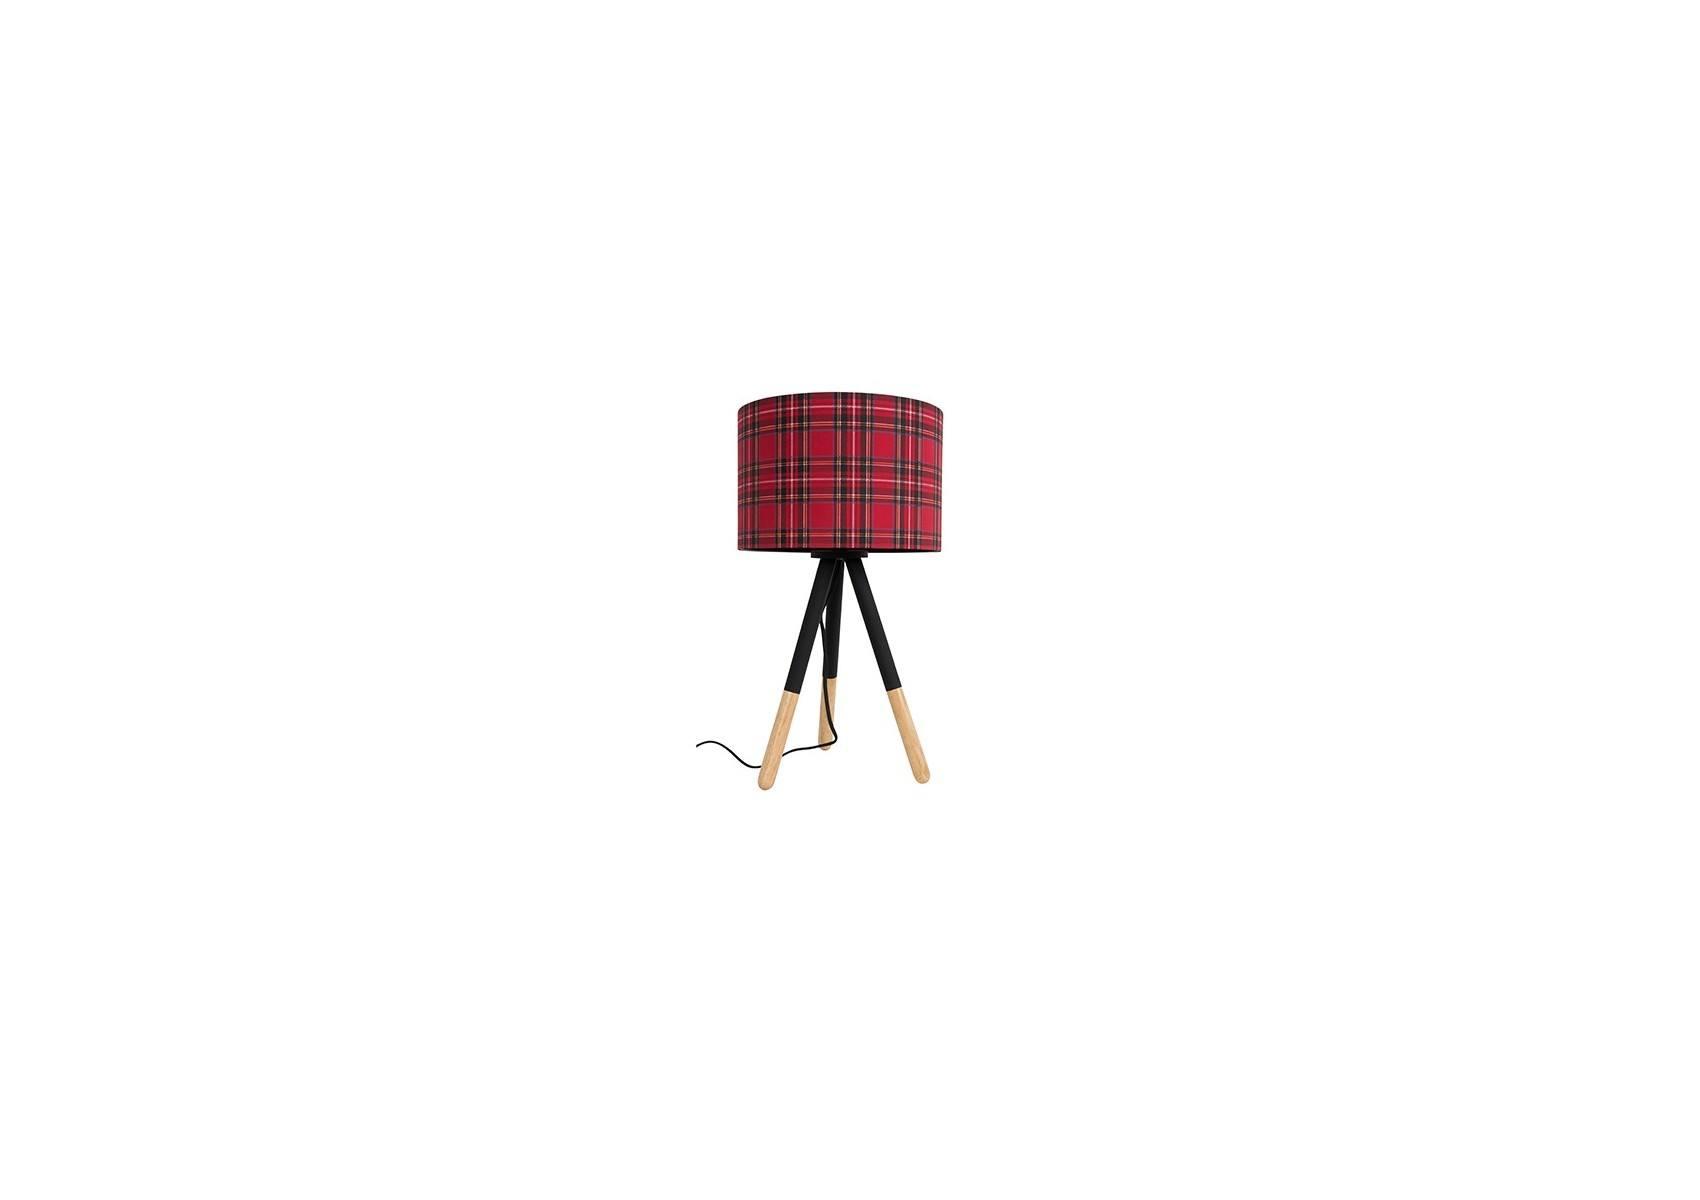 Poser Boite Highland Design Deco À Zuiver Lampe b7fgyY6